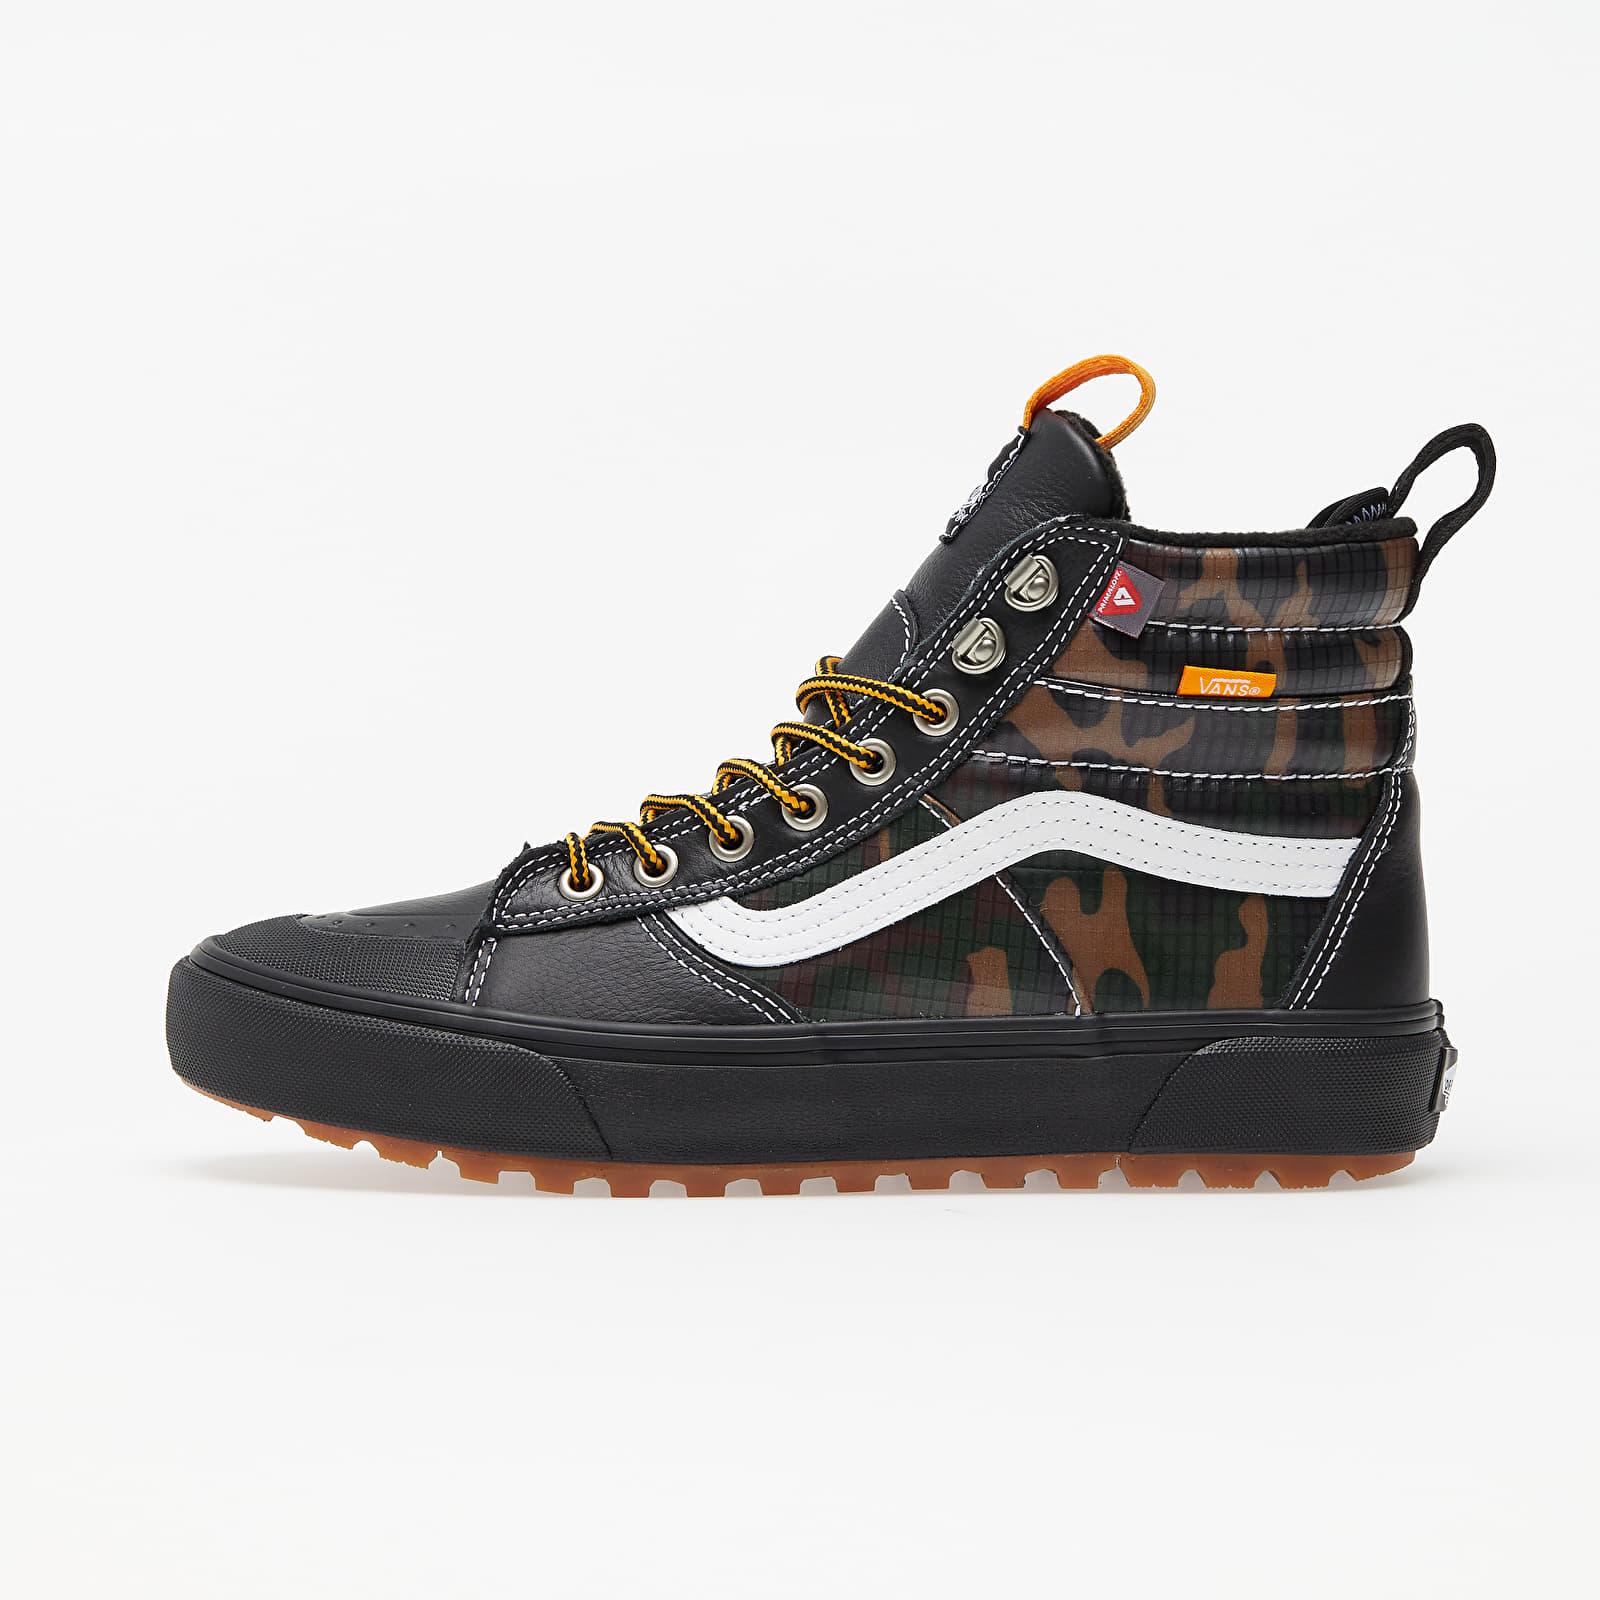 Men's shoes Vans Sk8-Hi MTE 2.0 DX (MTE) Black/ Camo